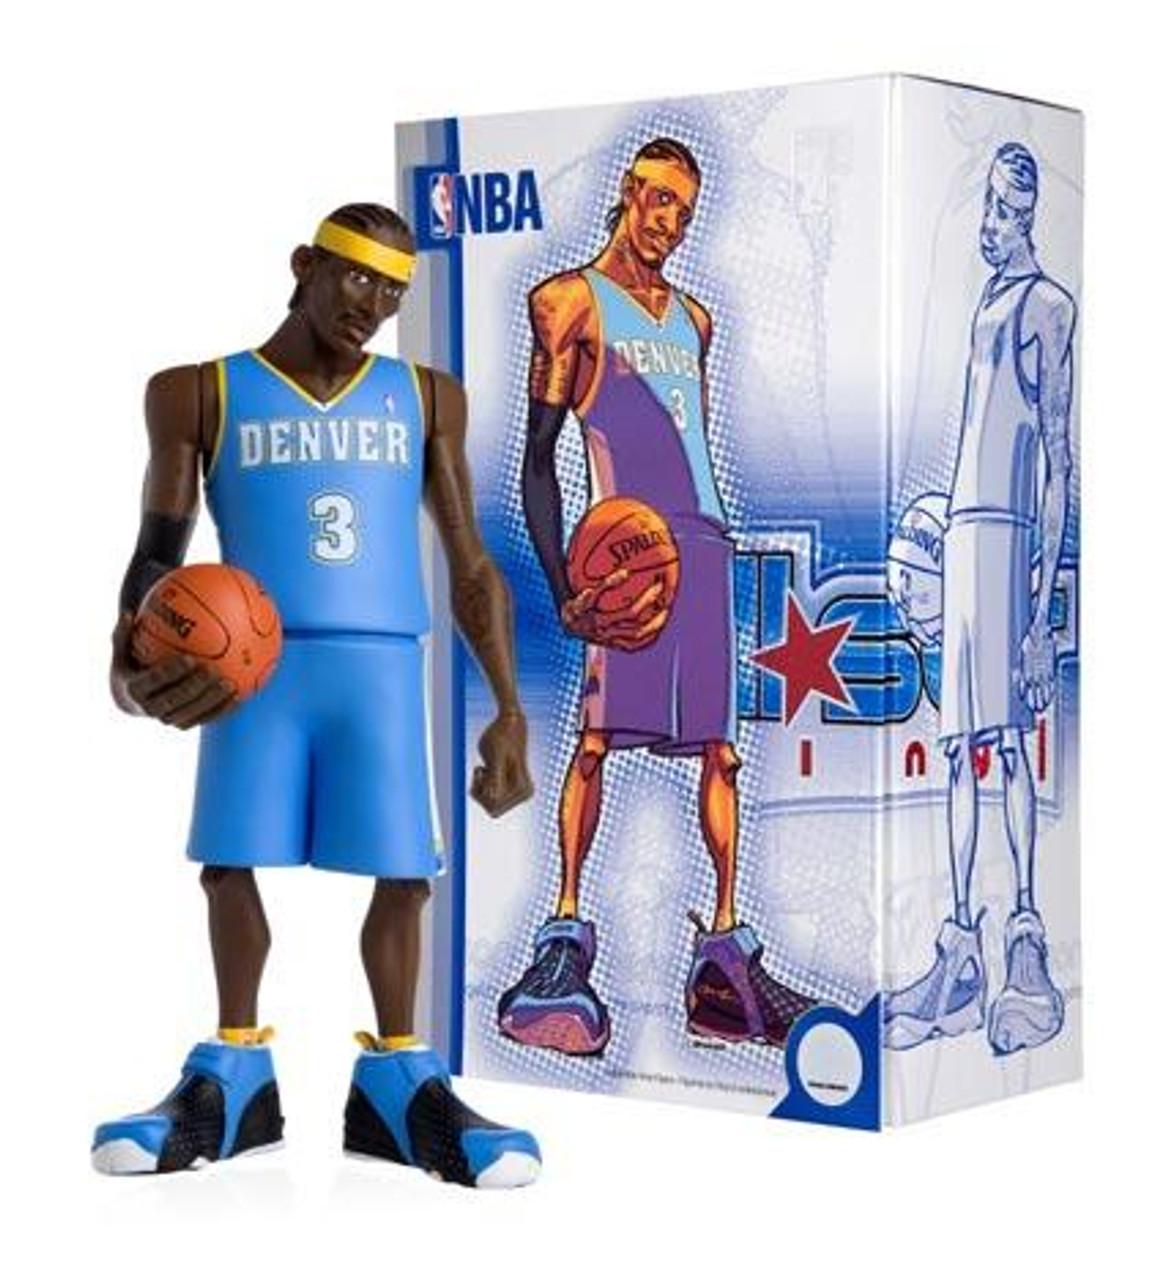 NBA Denver Nuggets All Star Vinyl Allen Iverson Vinyl Figure [Blue Away Jersey]